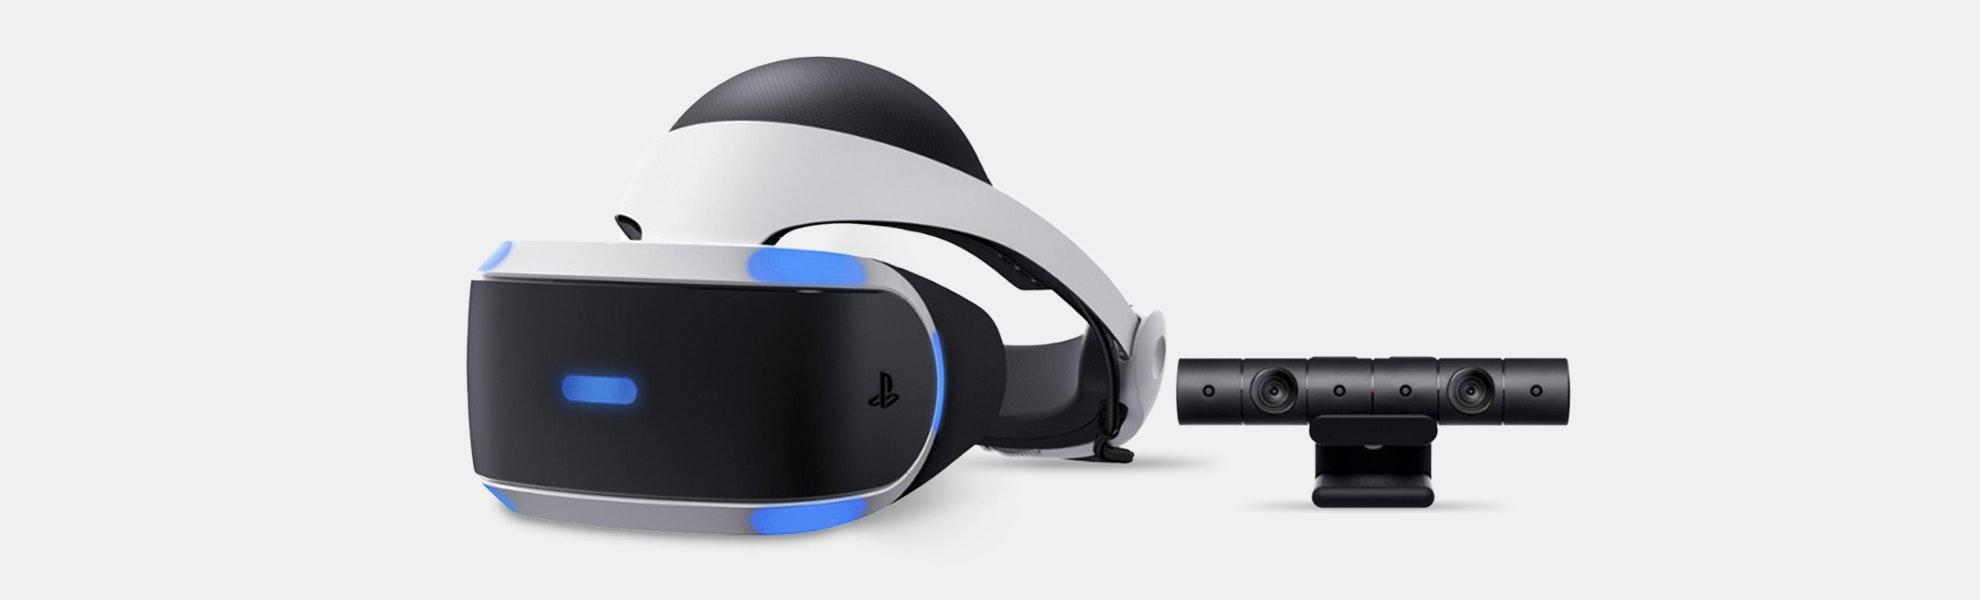 Sony PlayStation VR Headset & Camera Bundle